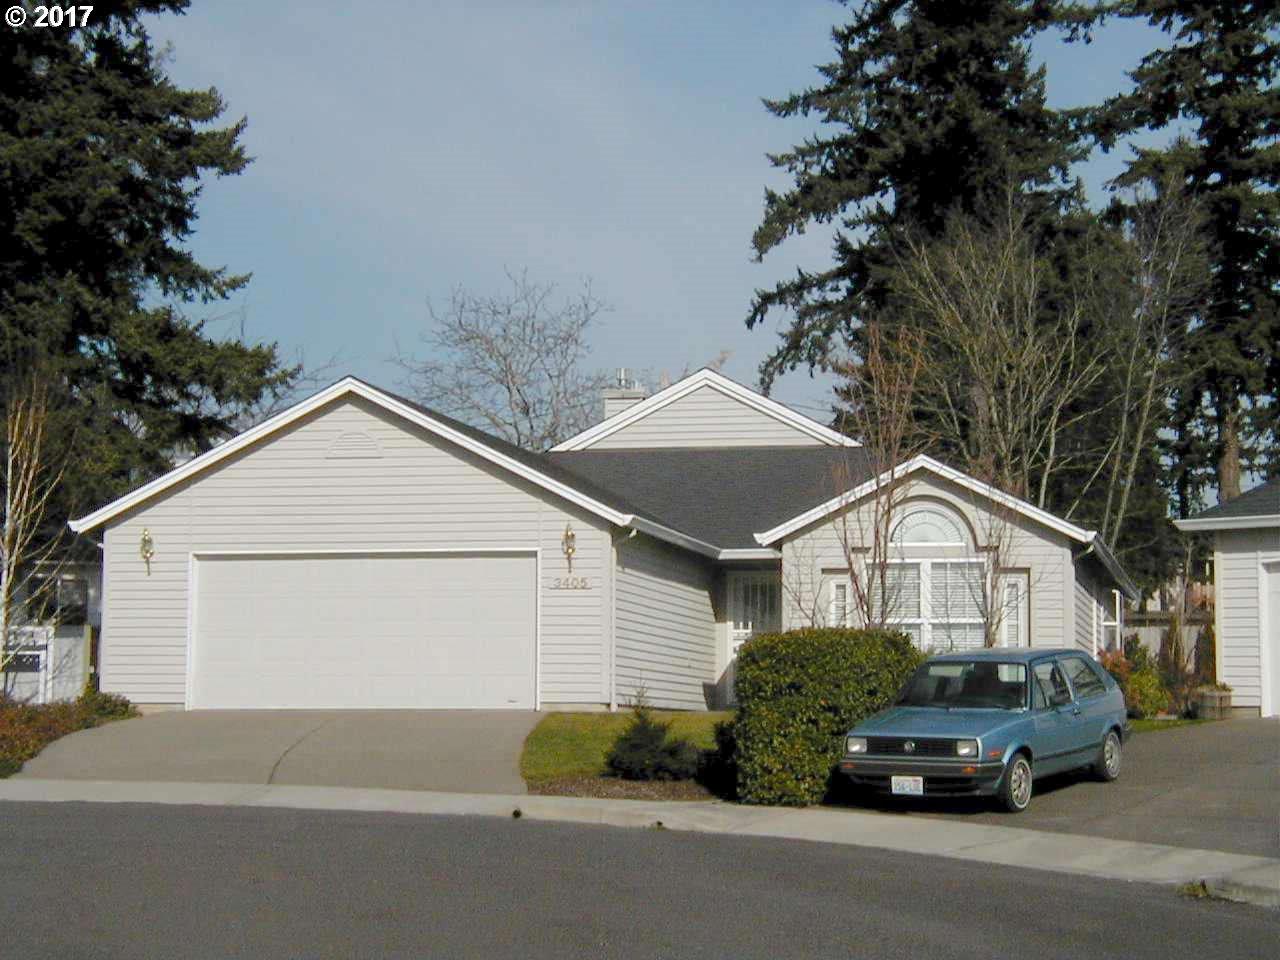 3405 SE BAYPOINT DR, Vancouver, WA 98683